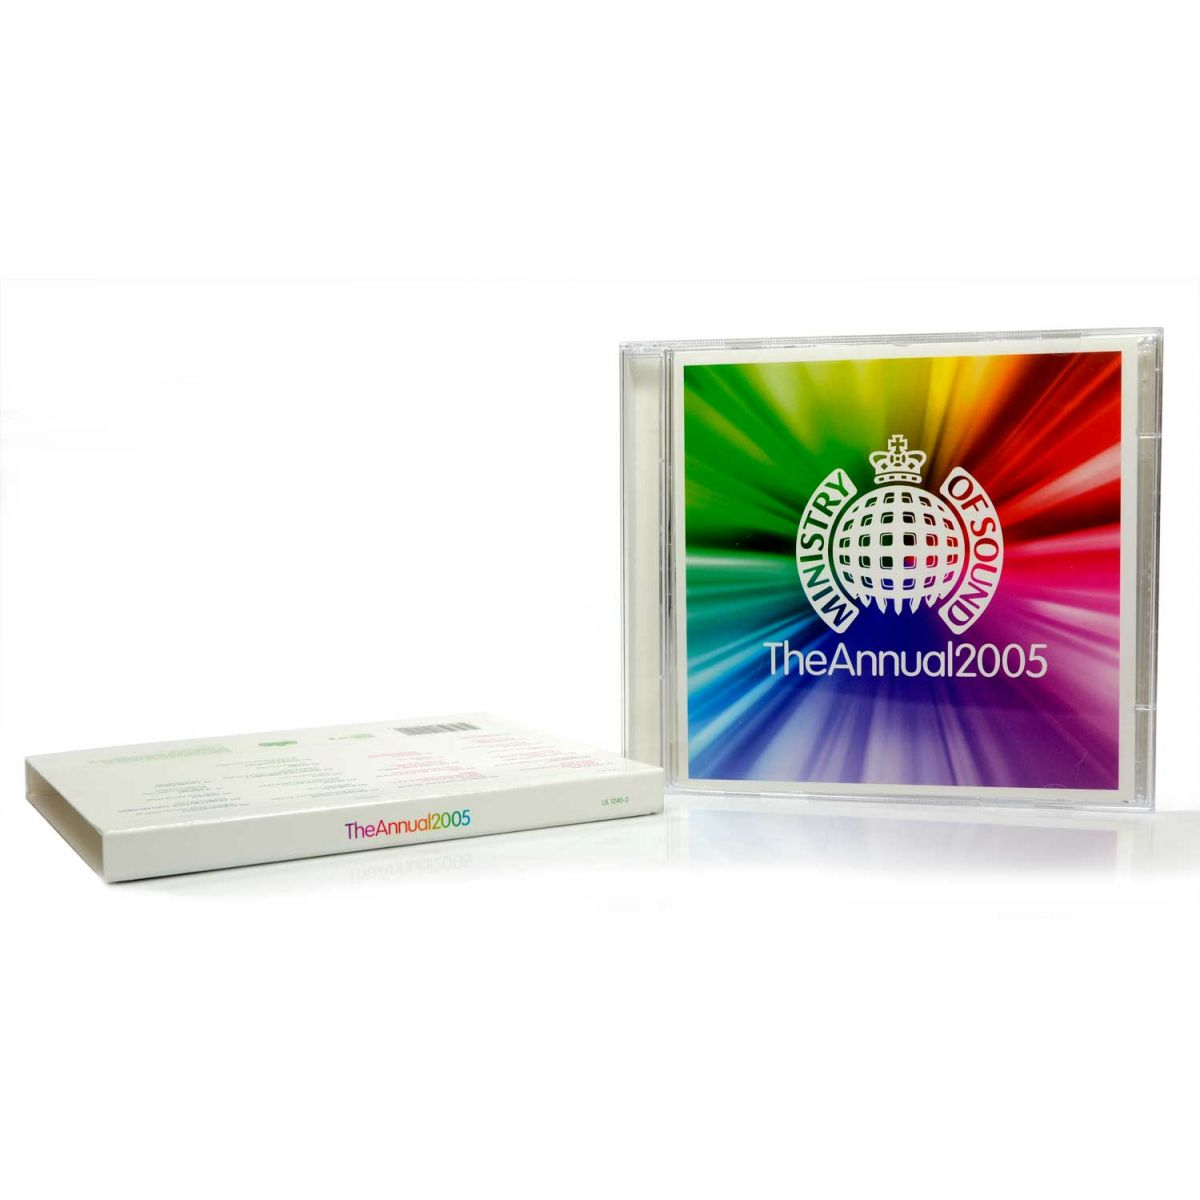 CD Duplo Ministry Of Sound The Annual 2005 - Importado - Lacrado